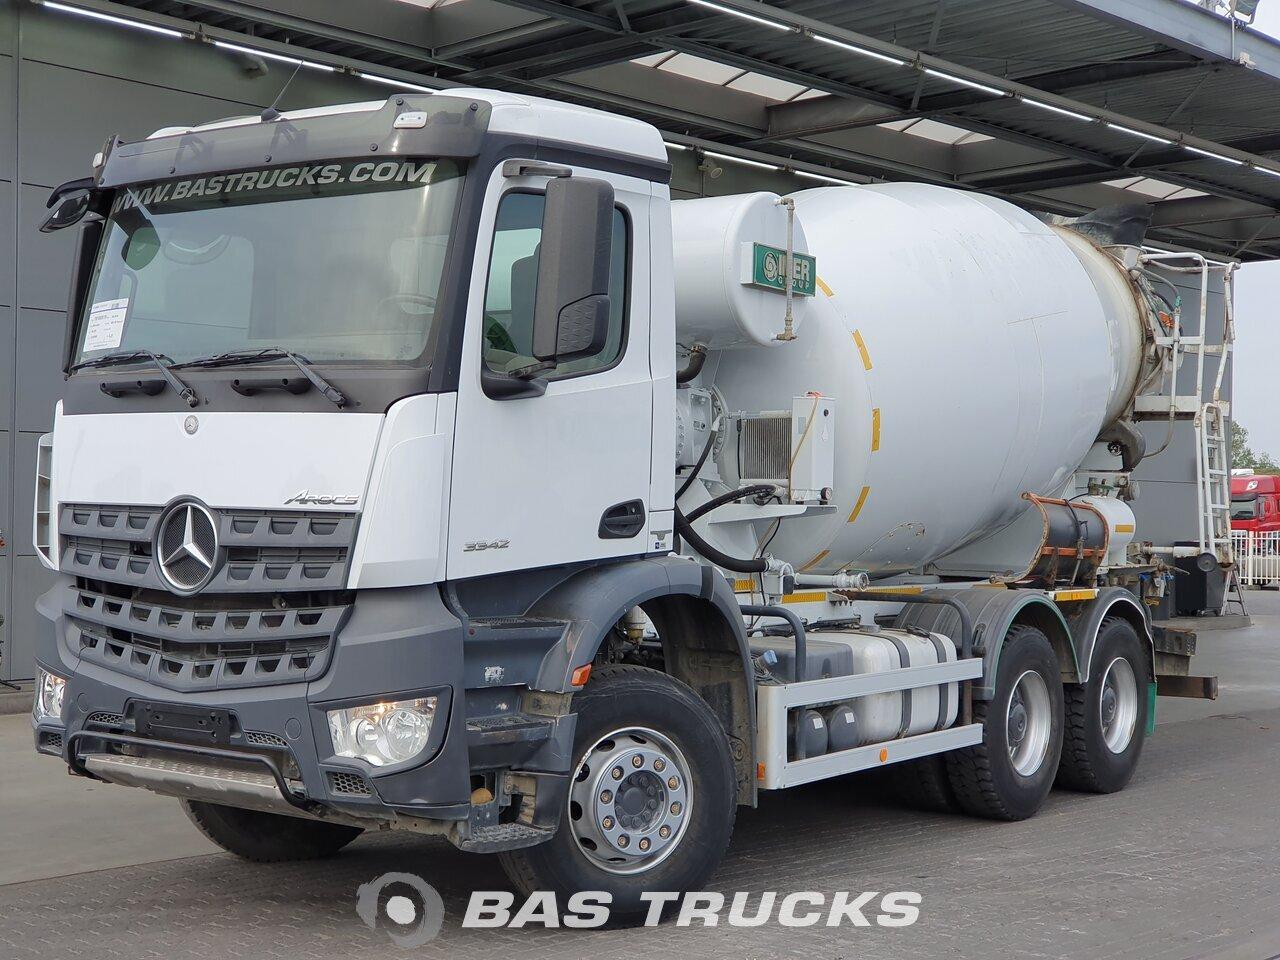 For sale at BAS Trucks: Mercedes Arocs 3342 6X4 08/2016